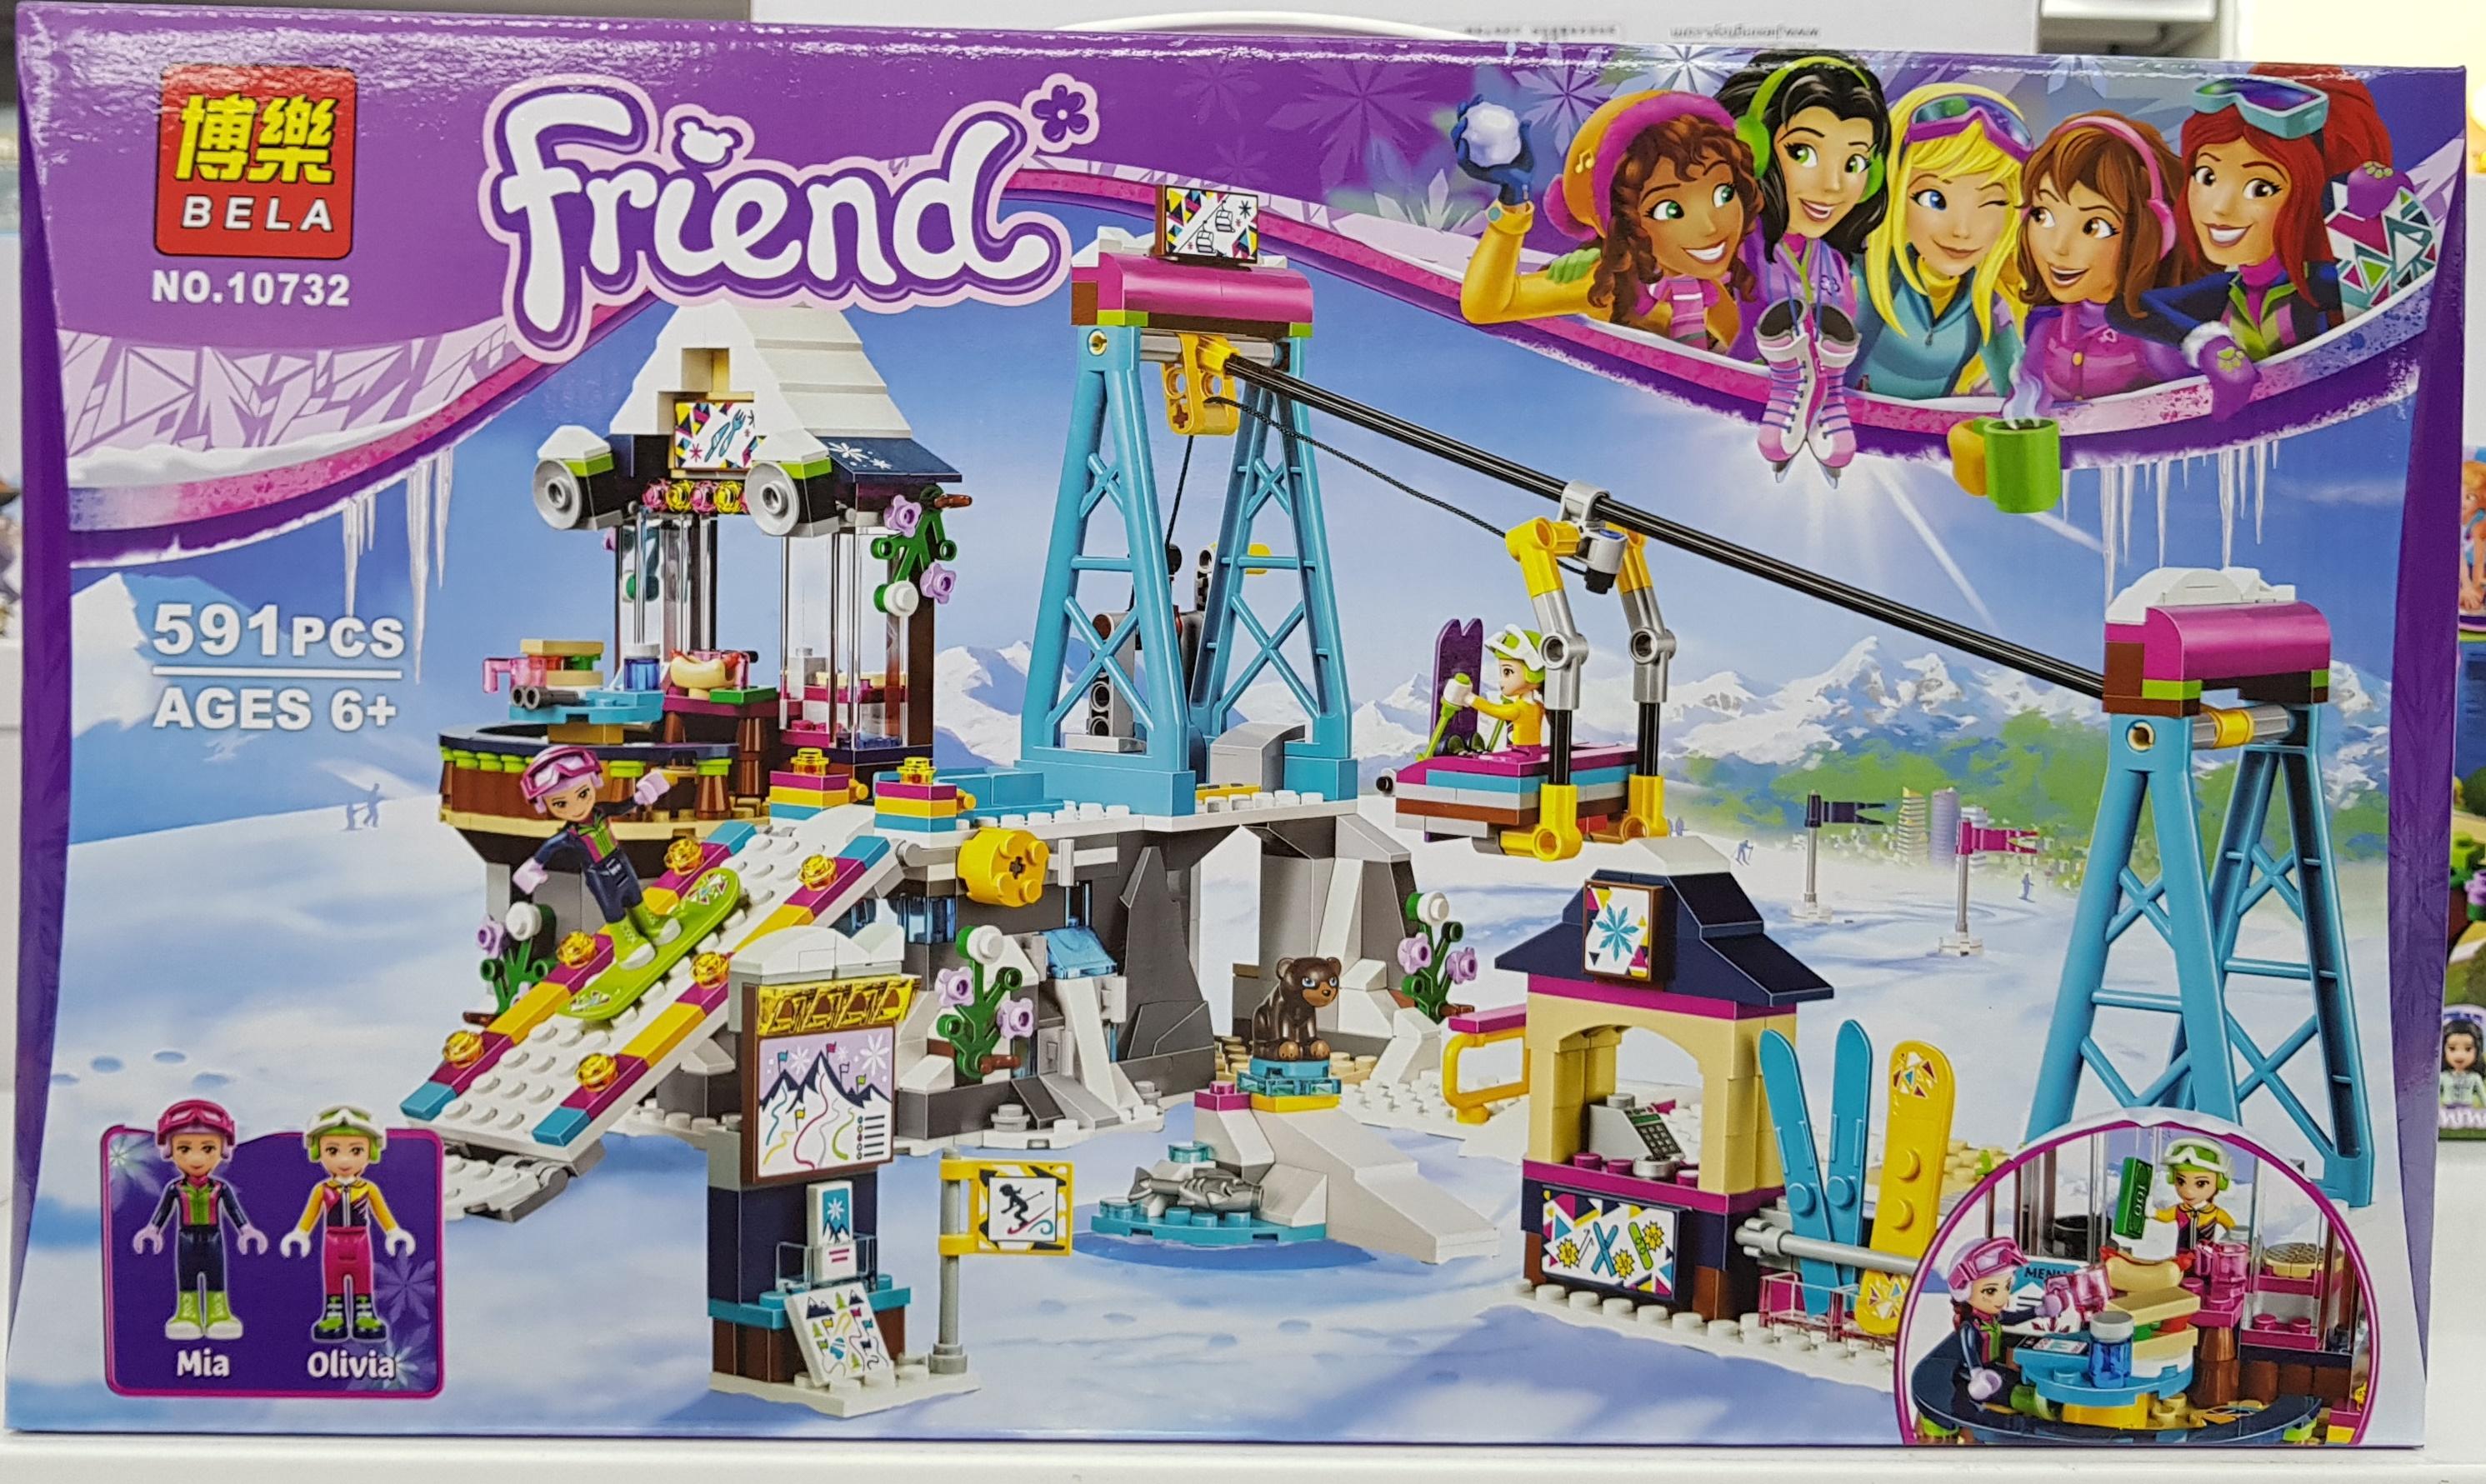 BELA FRIEND 10732 (591ชิ้น)